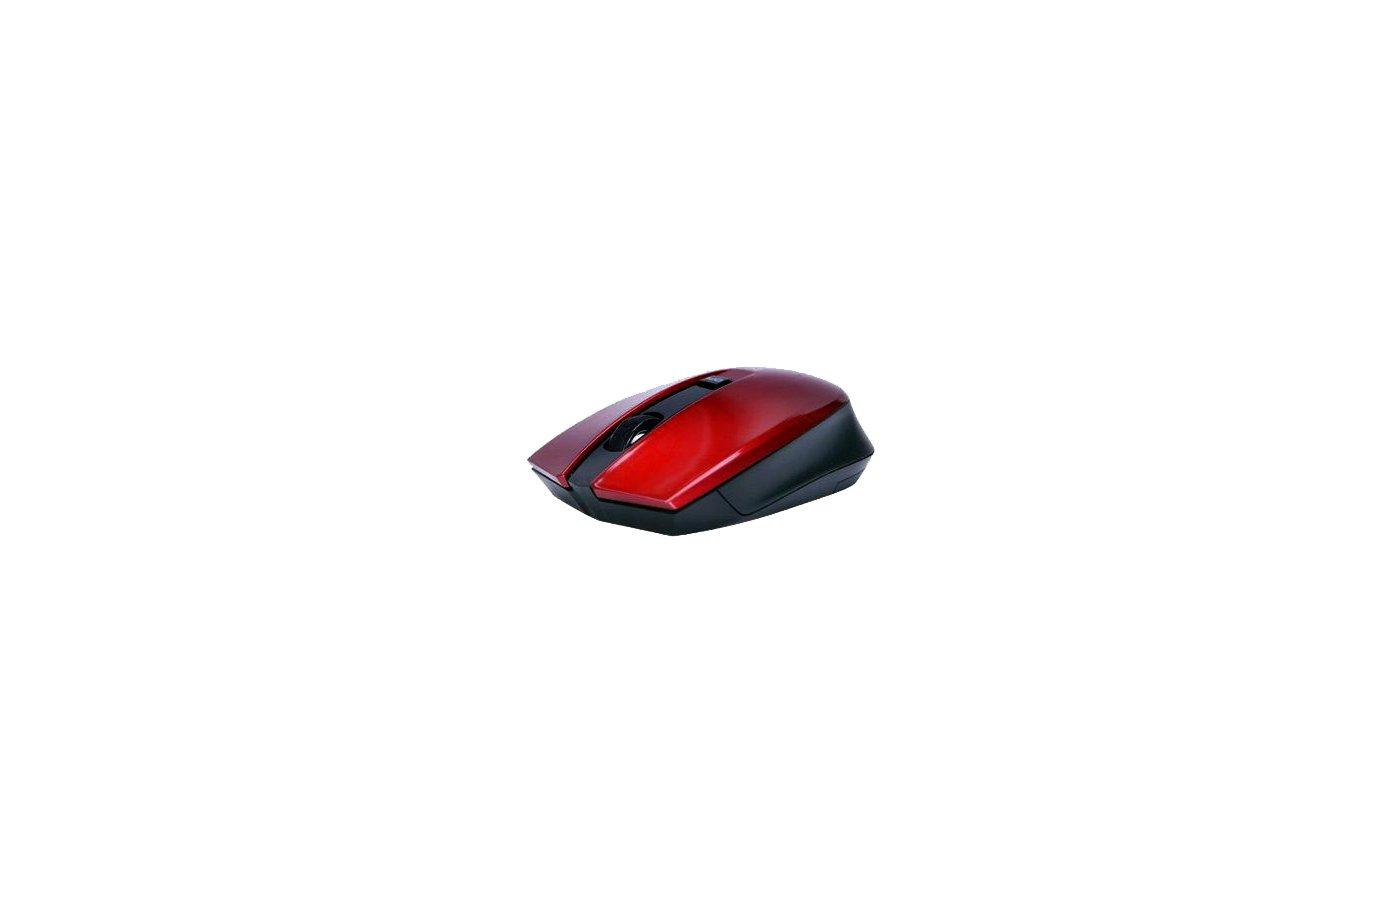 Мышь беспроводная Zalman ZM-M520W USB 1600dpi 2.4Ghz Wireless Avago A3000 sensor red